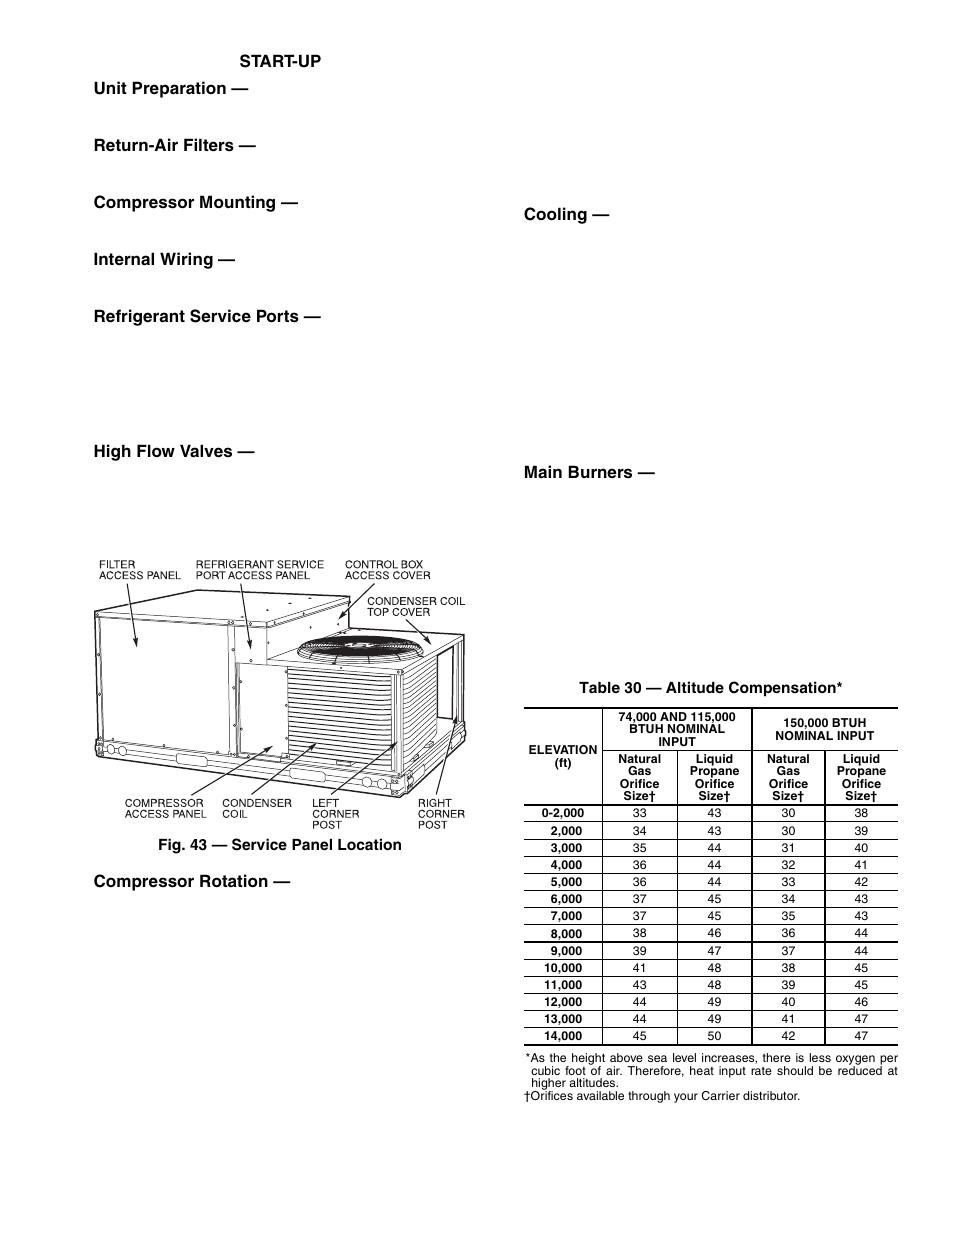 Start-up unit preparation, Return-air filters, Compressor mounting |  Internal wiring